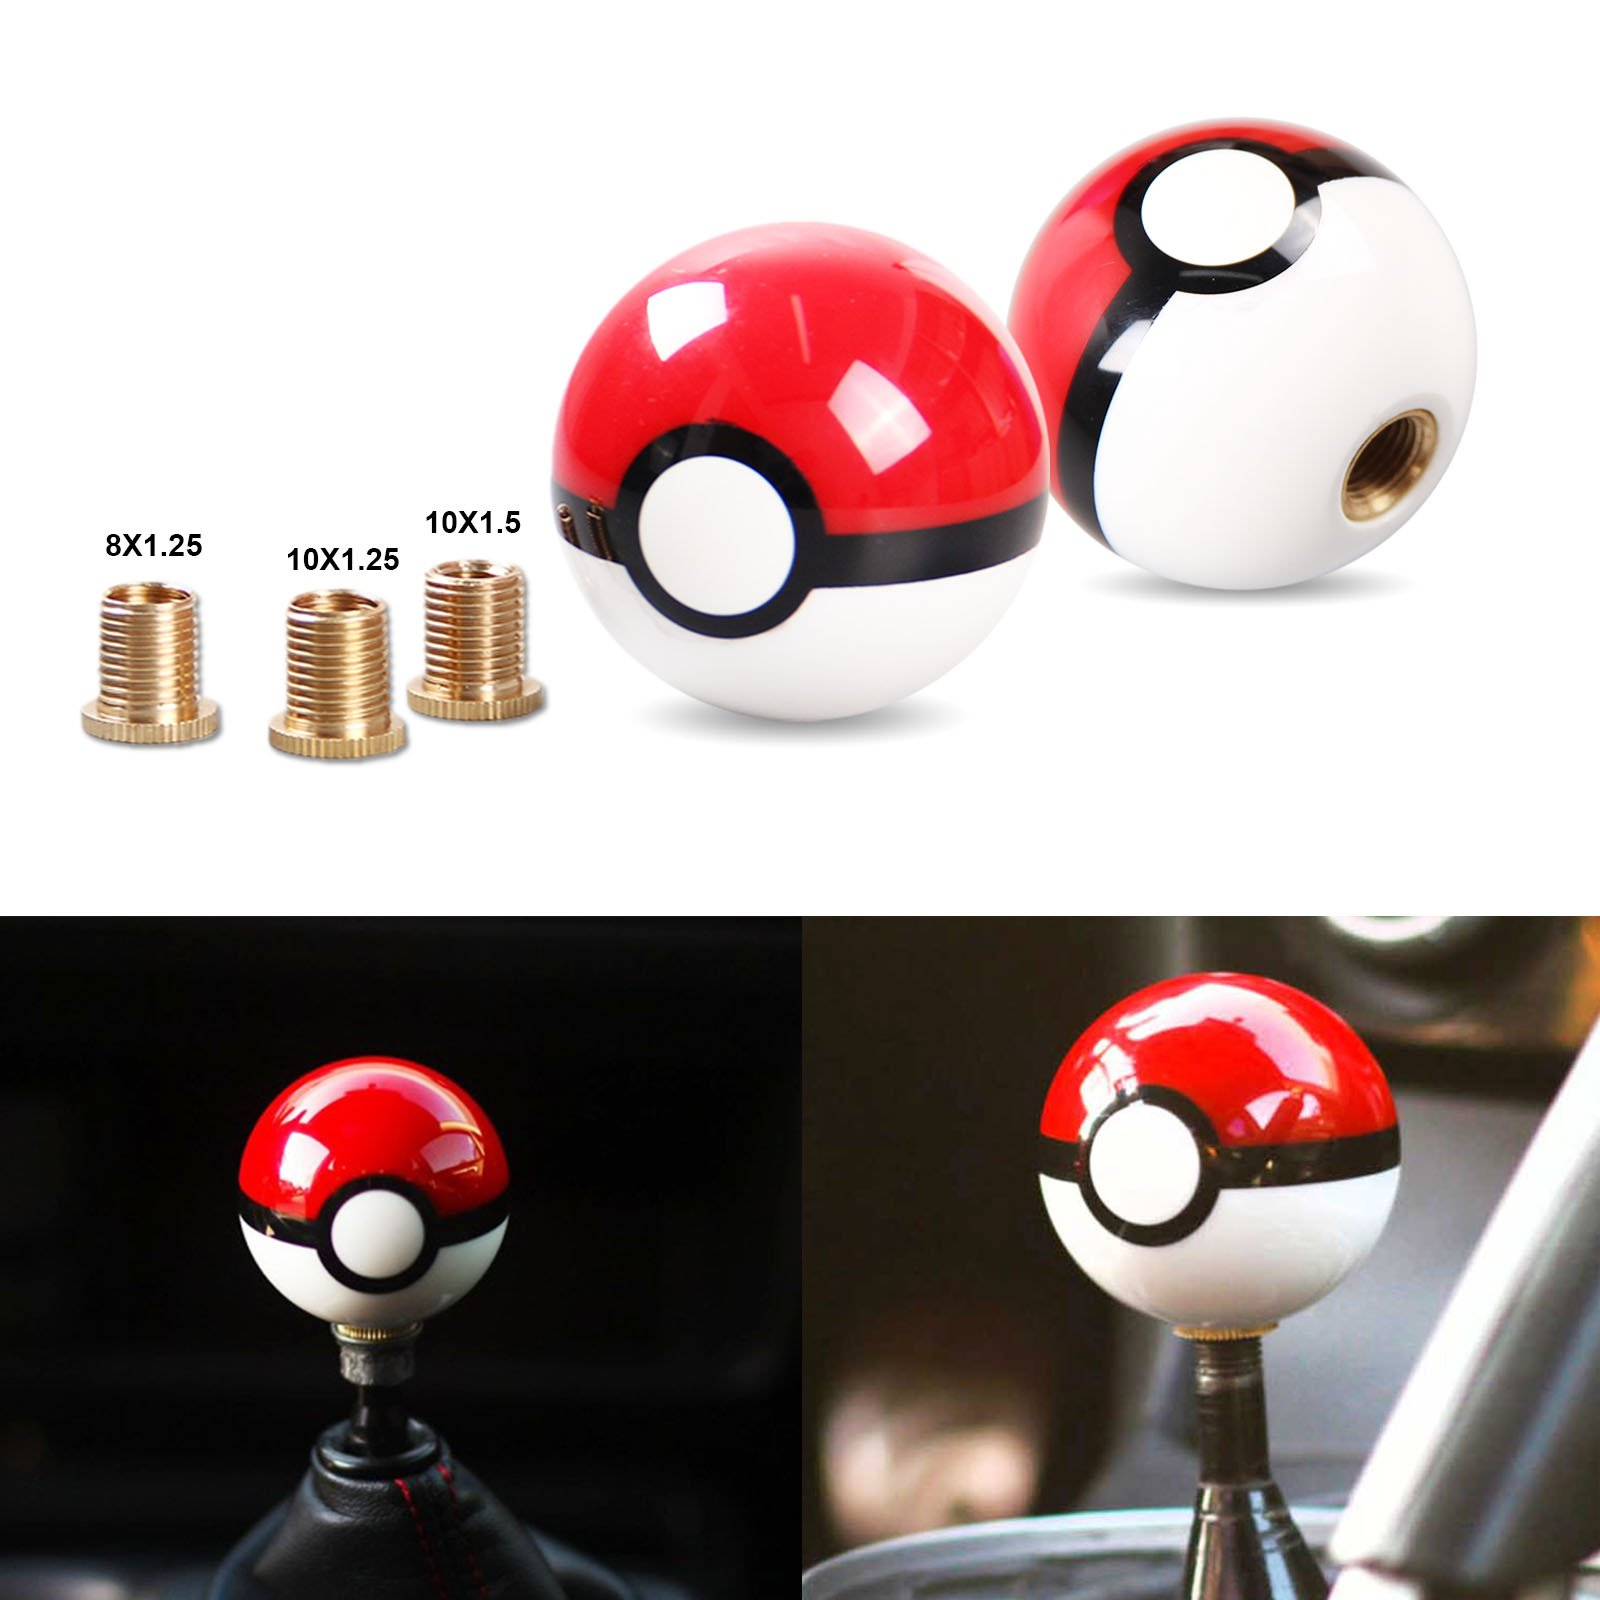 Universal Pokemon Poke Ball Shift Knob M10X1.25 for Acura Toyota Honda